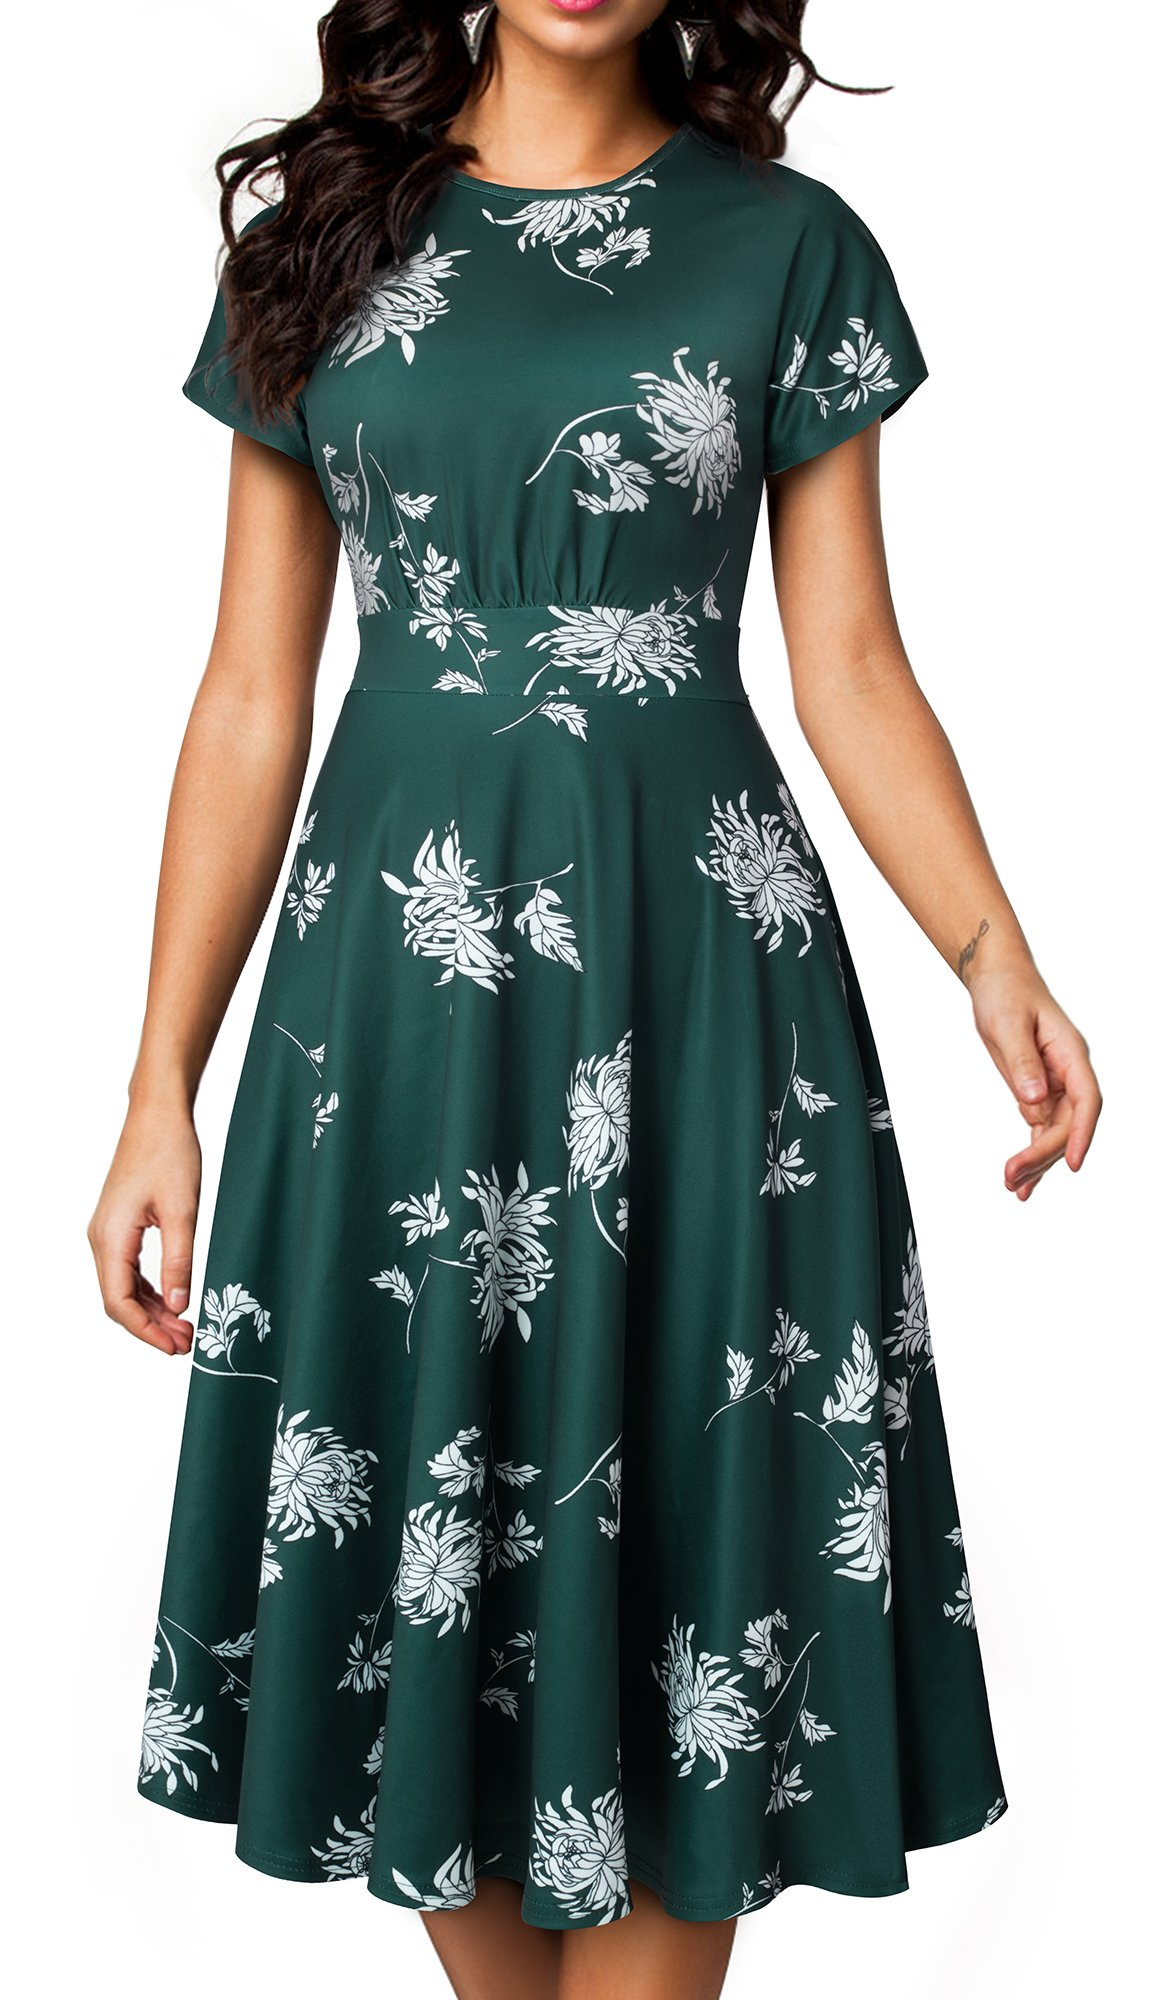 HOMEYEE Women's Short Sleeve Floral Casual Aline Midi Dress A102(6,Green)